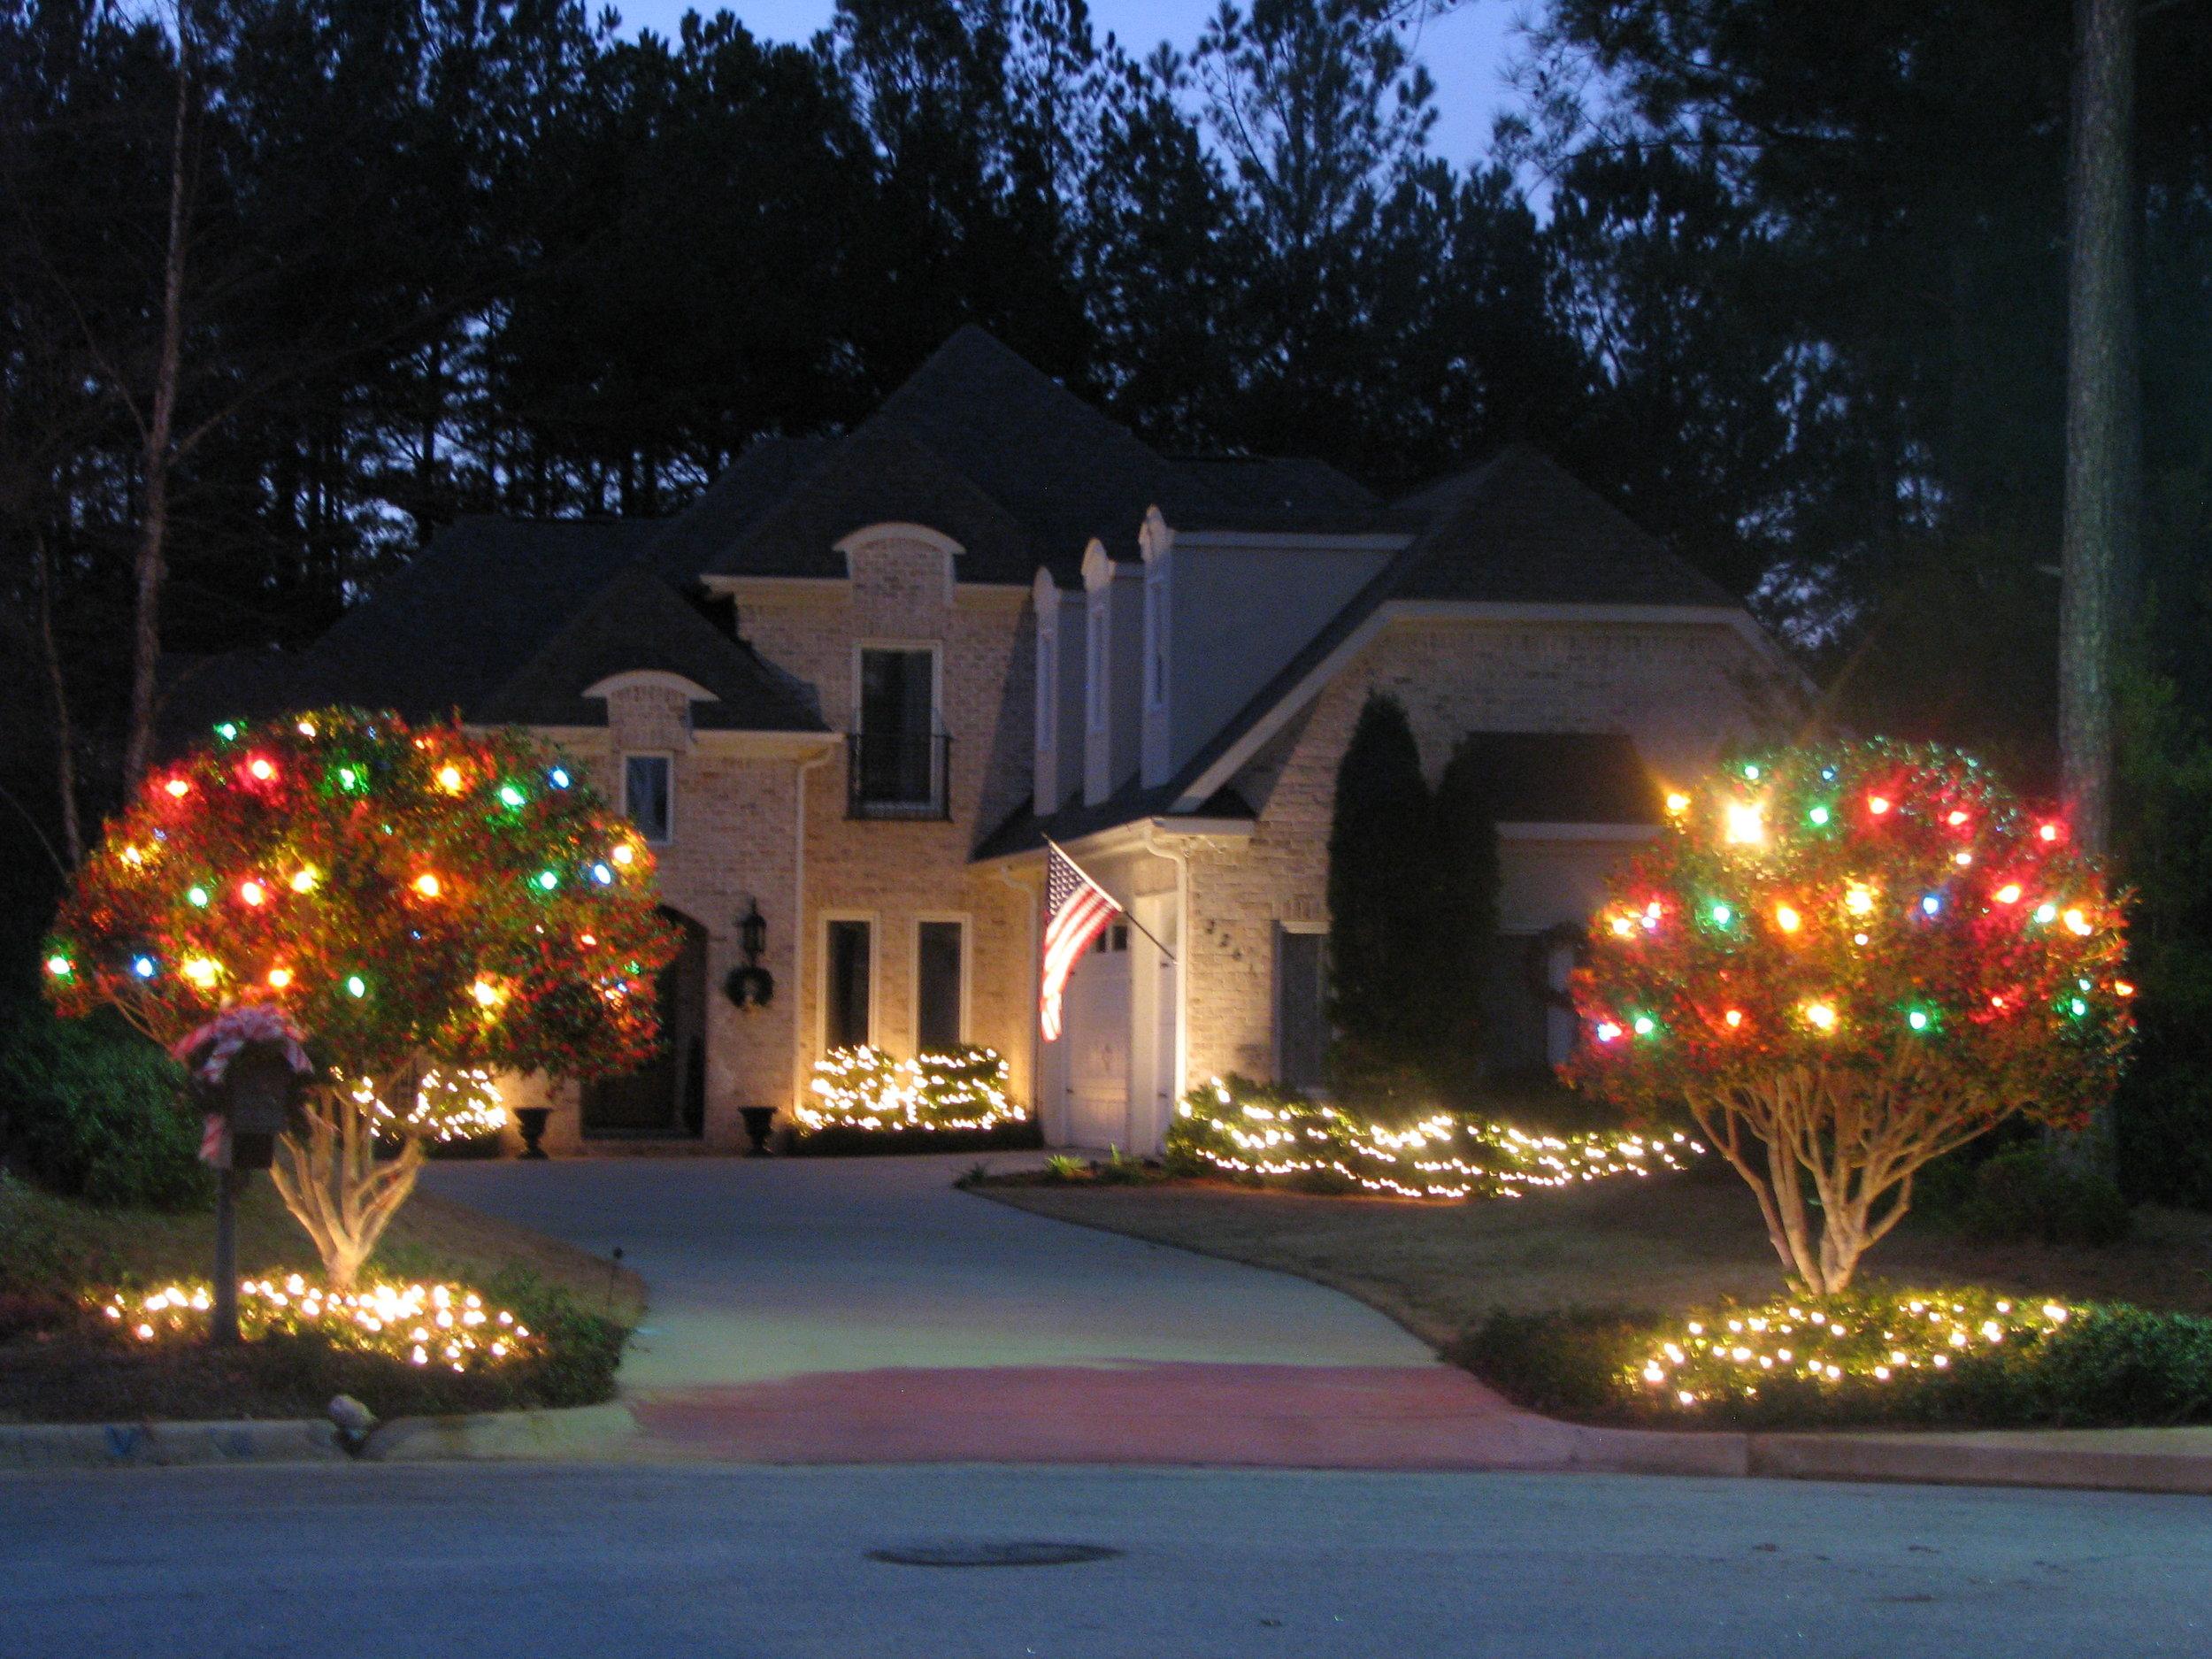 glitter and glow chrismas decor residential exterior (4).JPG